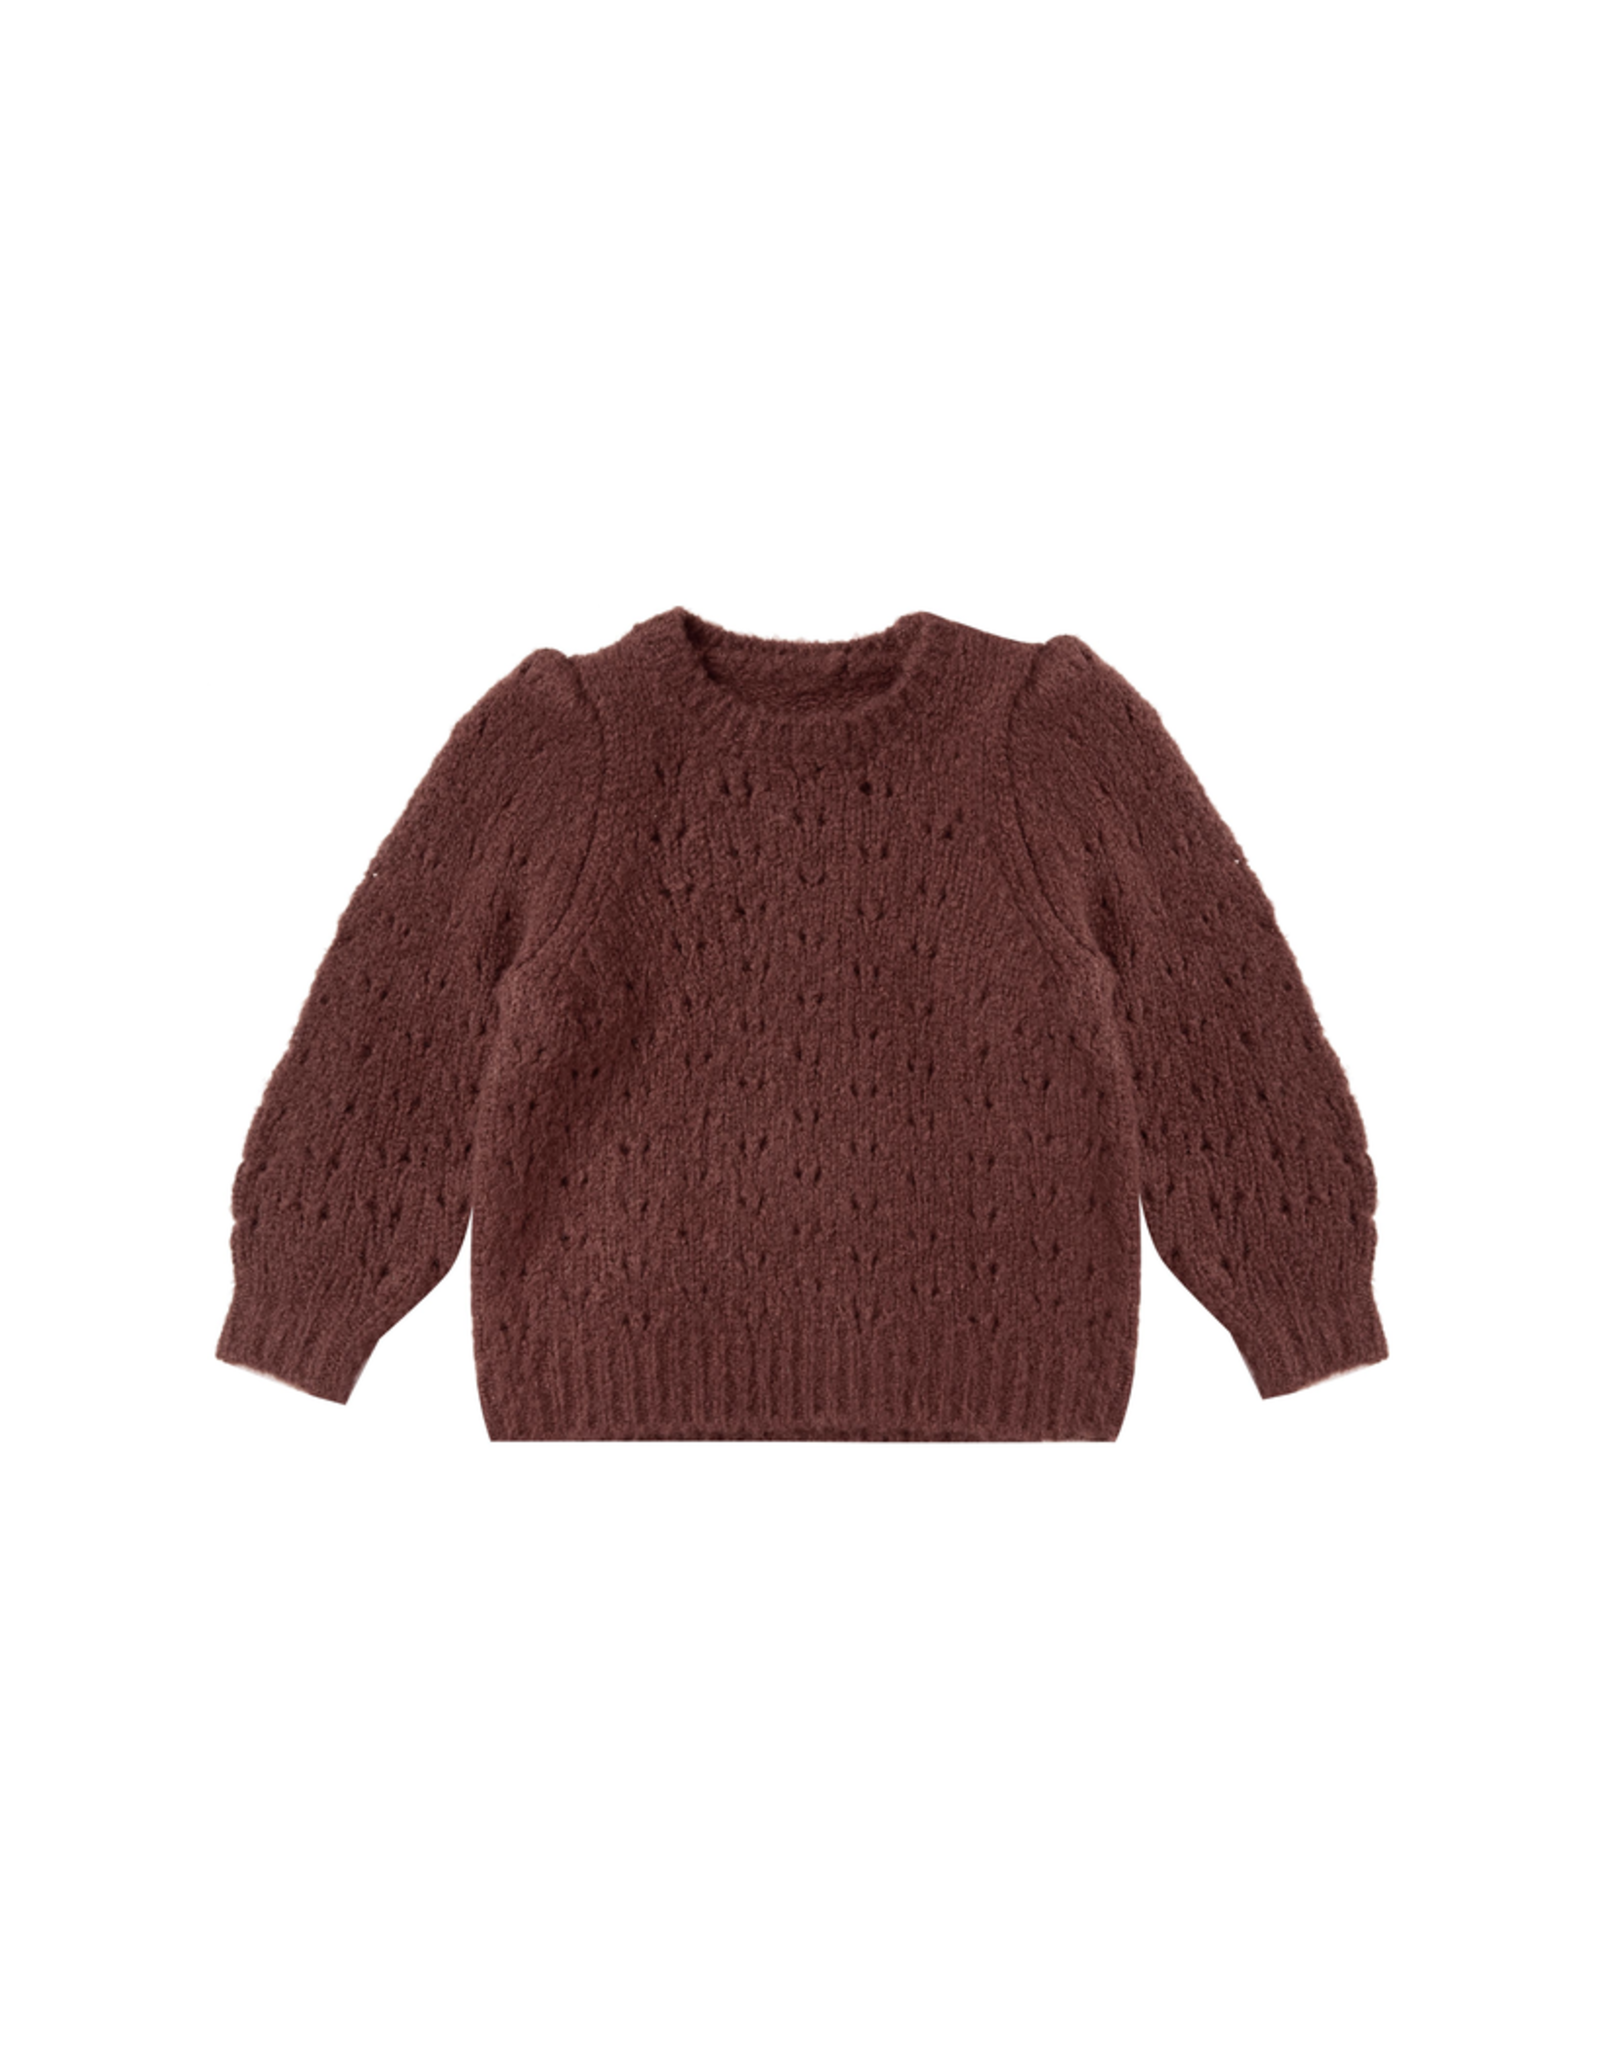 rylee cru rylee + cru balloon sweater